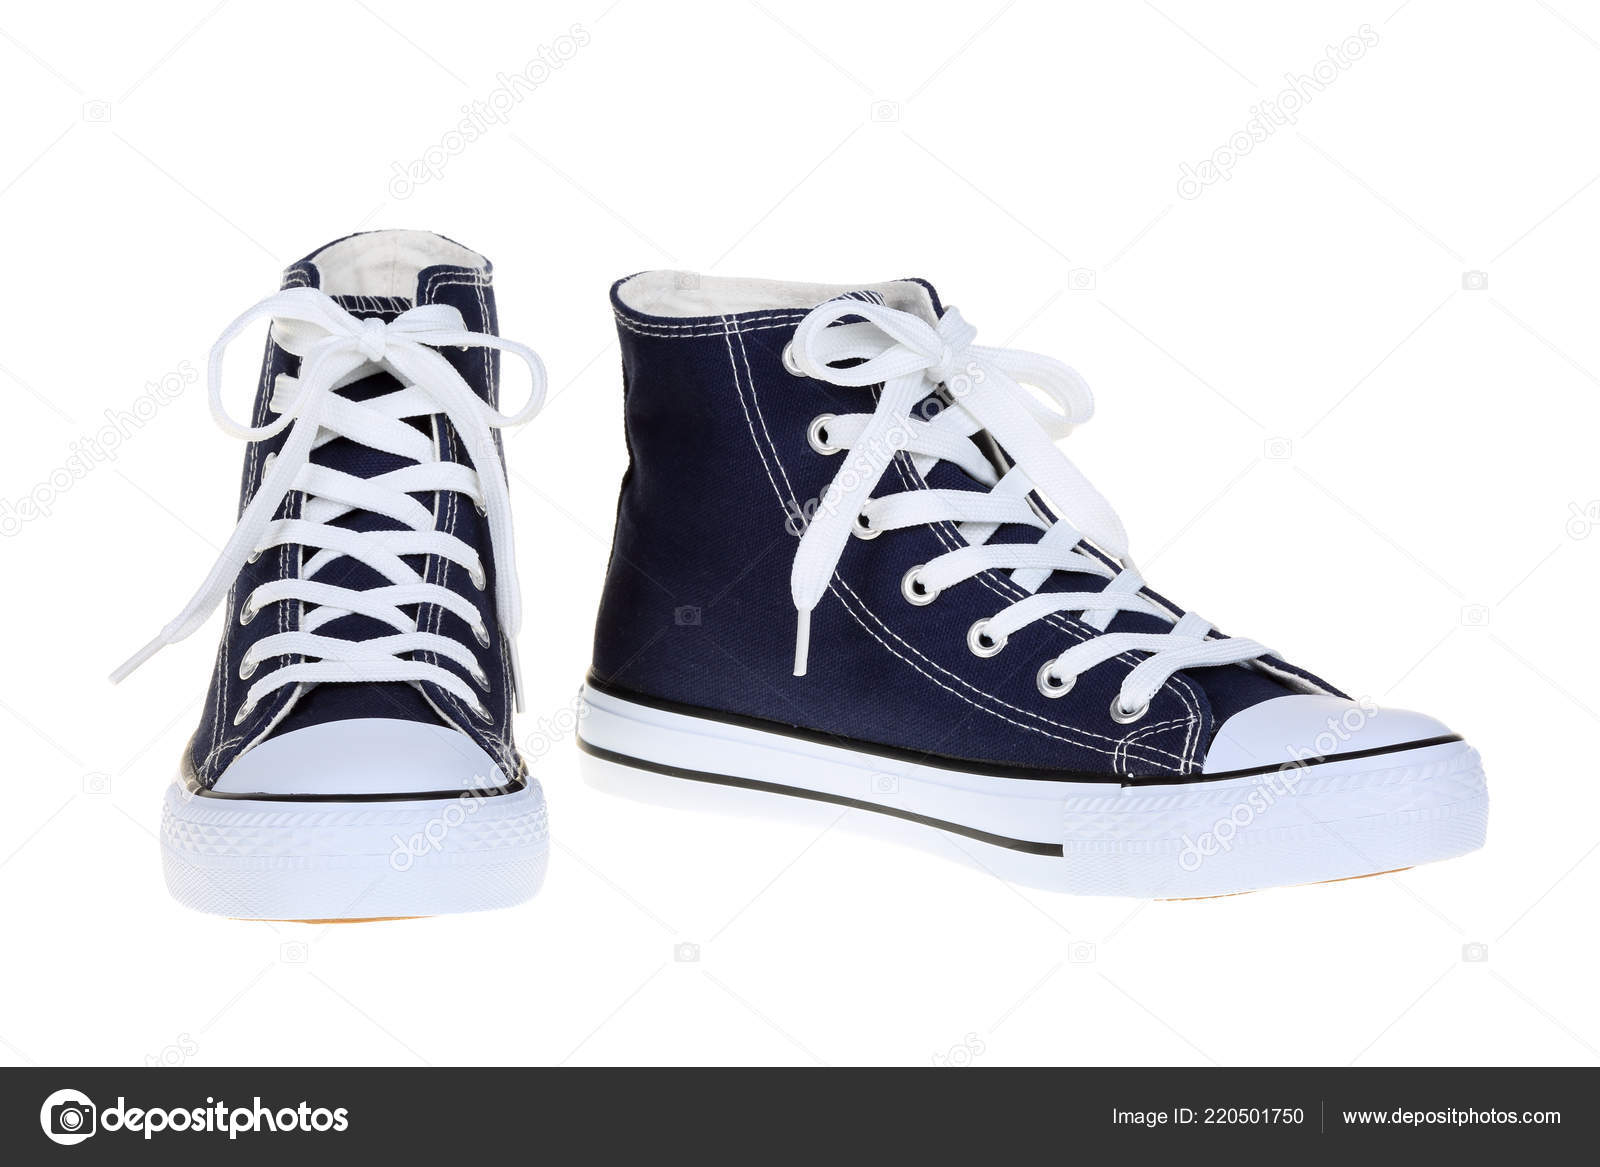 94cfc2190cc Ζευγάρι Γυναικών Υψηλή Κορυφή Sneakers Σκούρο Μπλε Navy ...